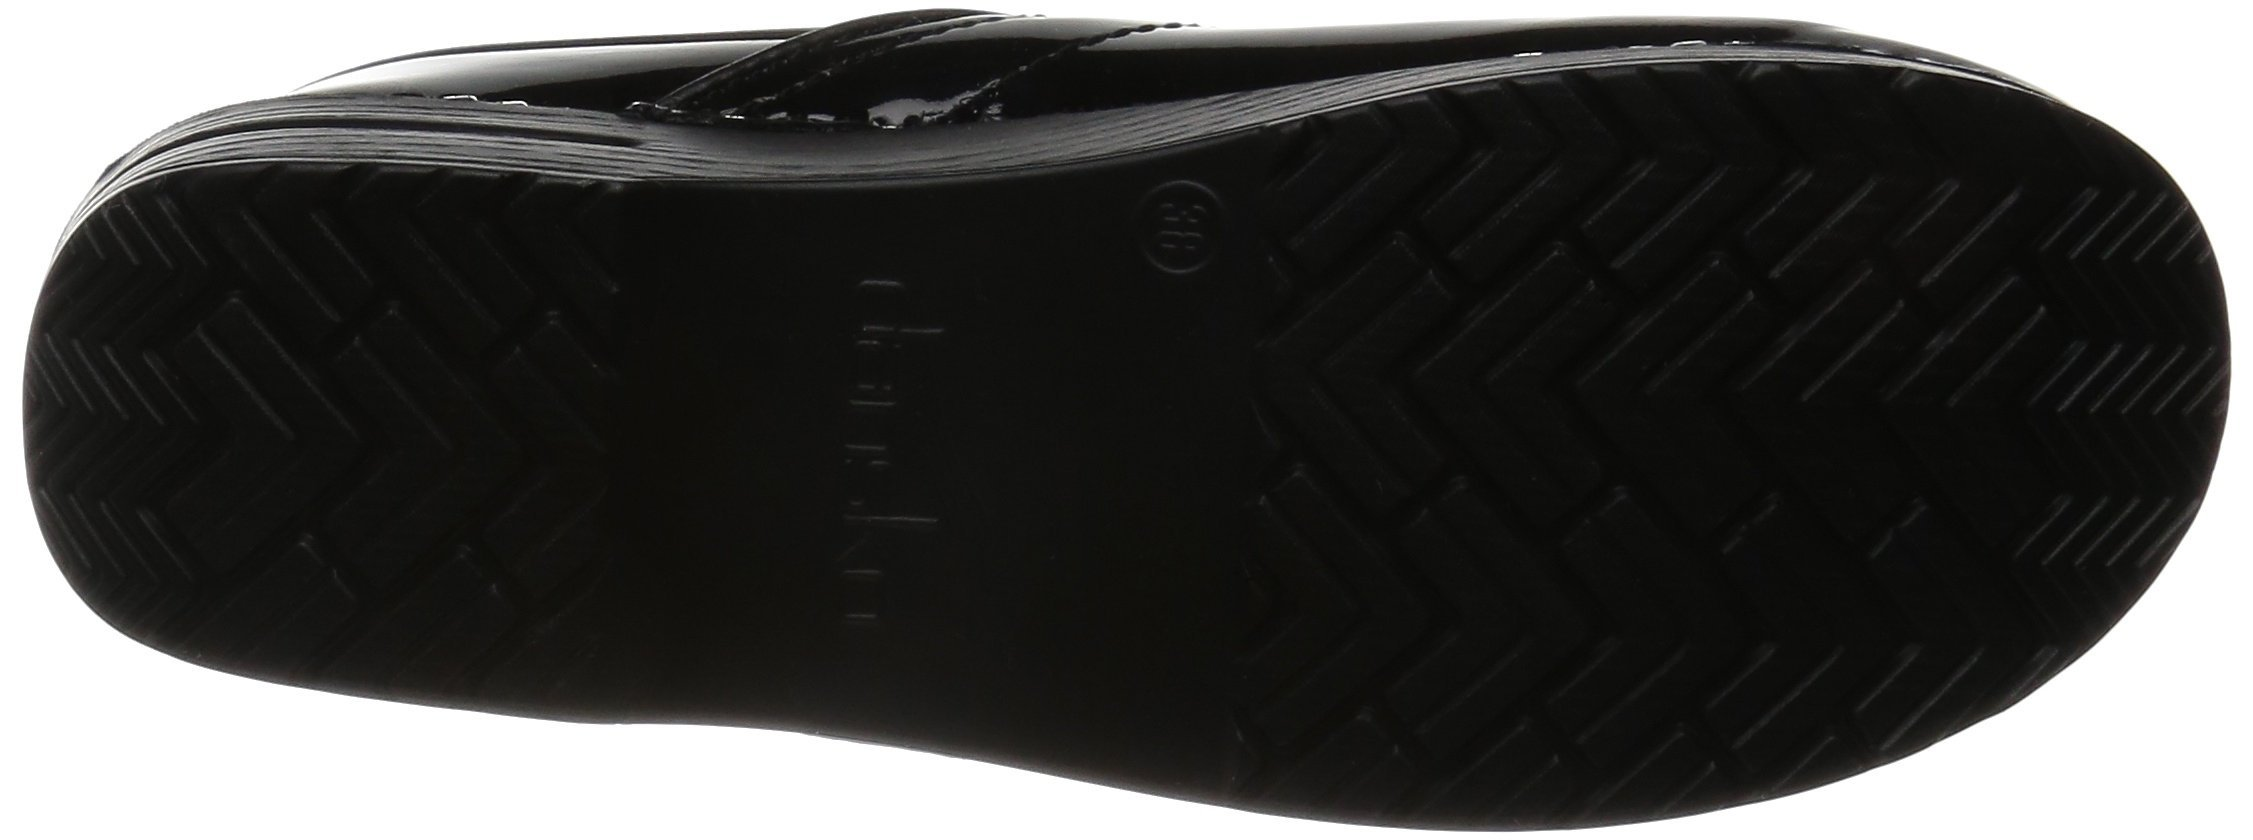 Dansko Women's Professional Patent Leather Clog,Black Patent,37 EU / 6.5-7 B(M) US by Dansko (Image #3)